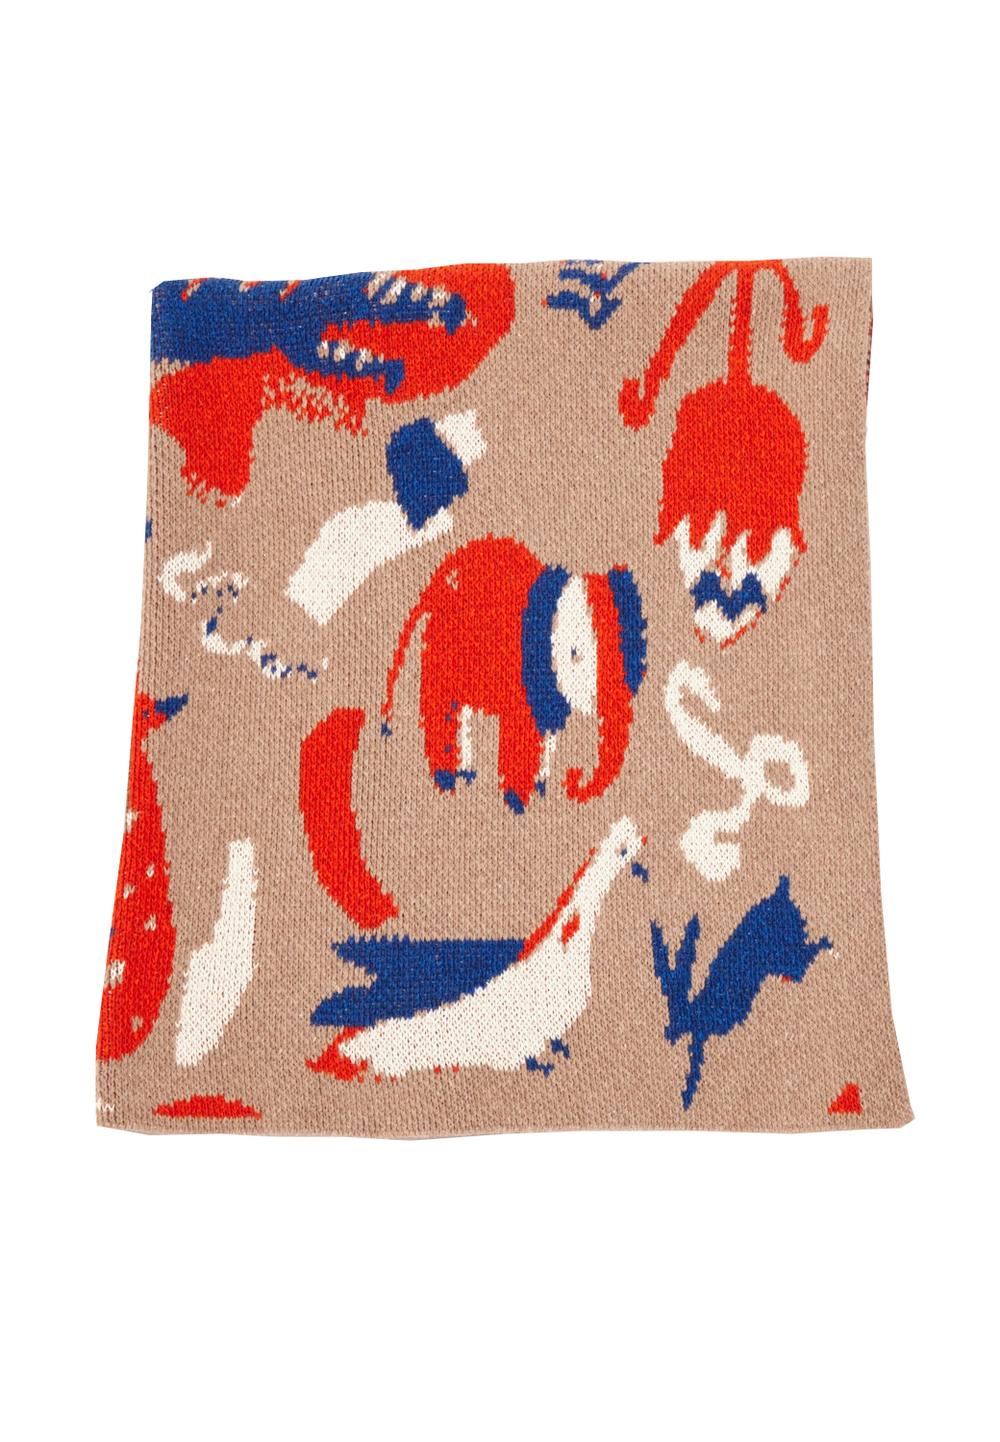 CLEAN_1500p-Sproat_160615_Blankets_0109.jpg